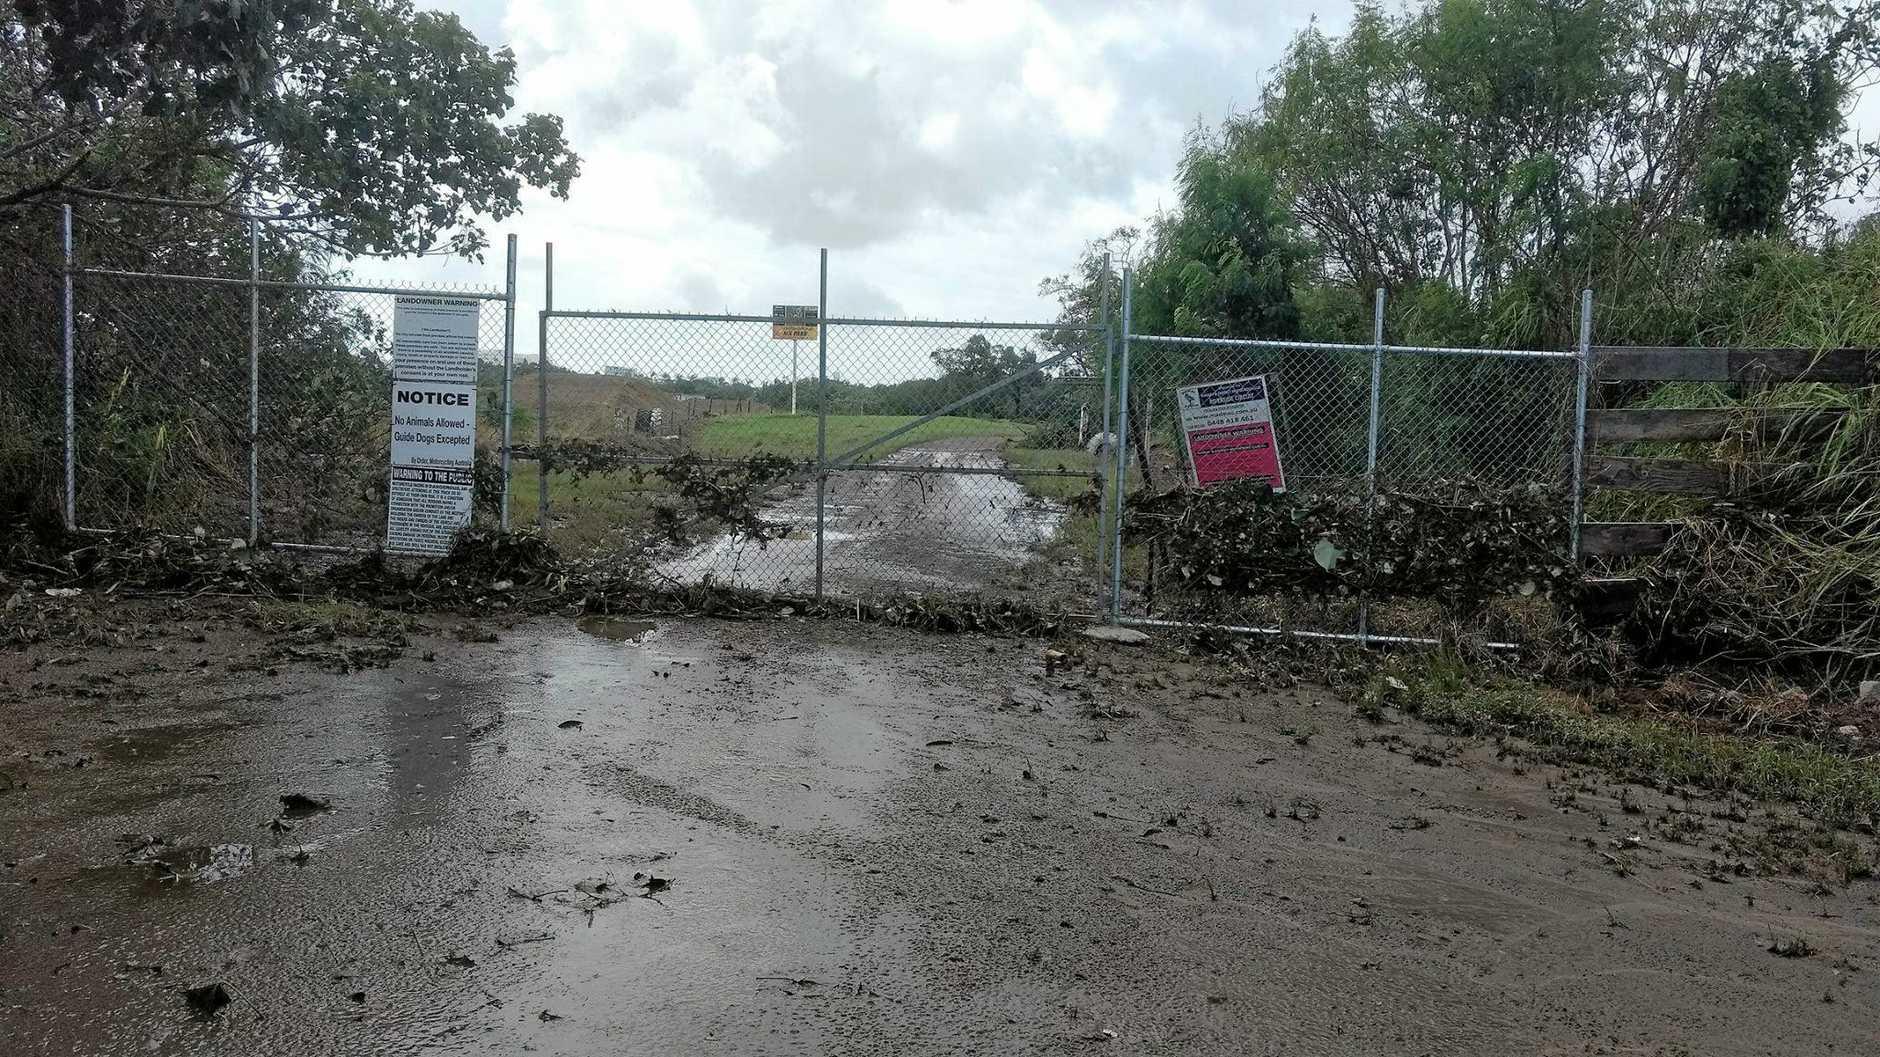 The entrance to Mackay Junior Motocross.